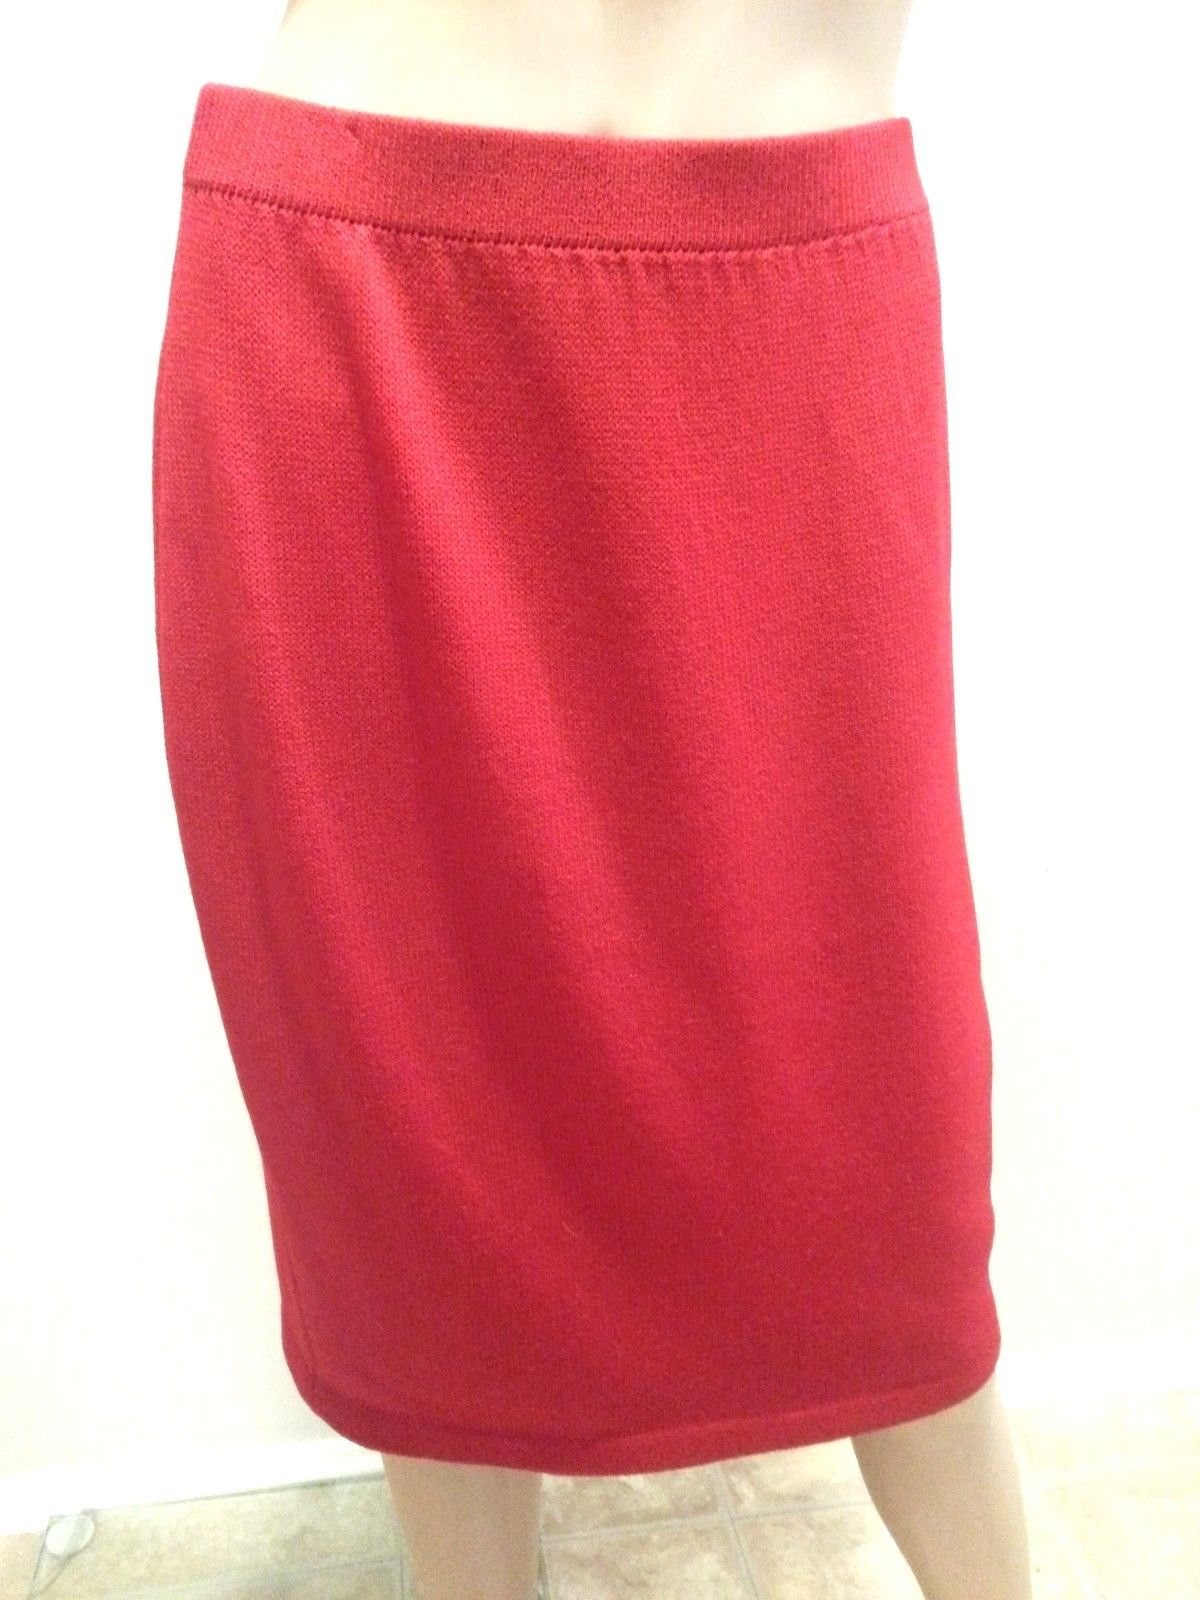 St. John Collection Marie Gray Dark Red Santana Knit Pencil Skirt 8 - $123.49